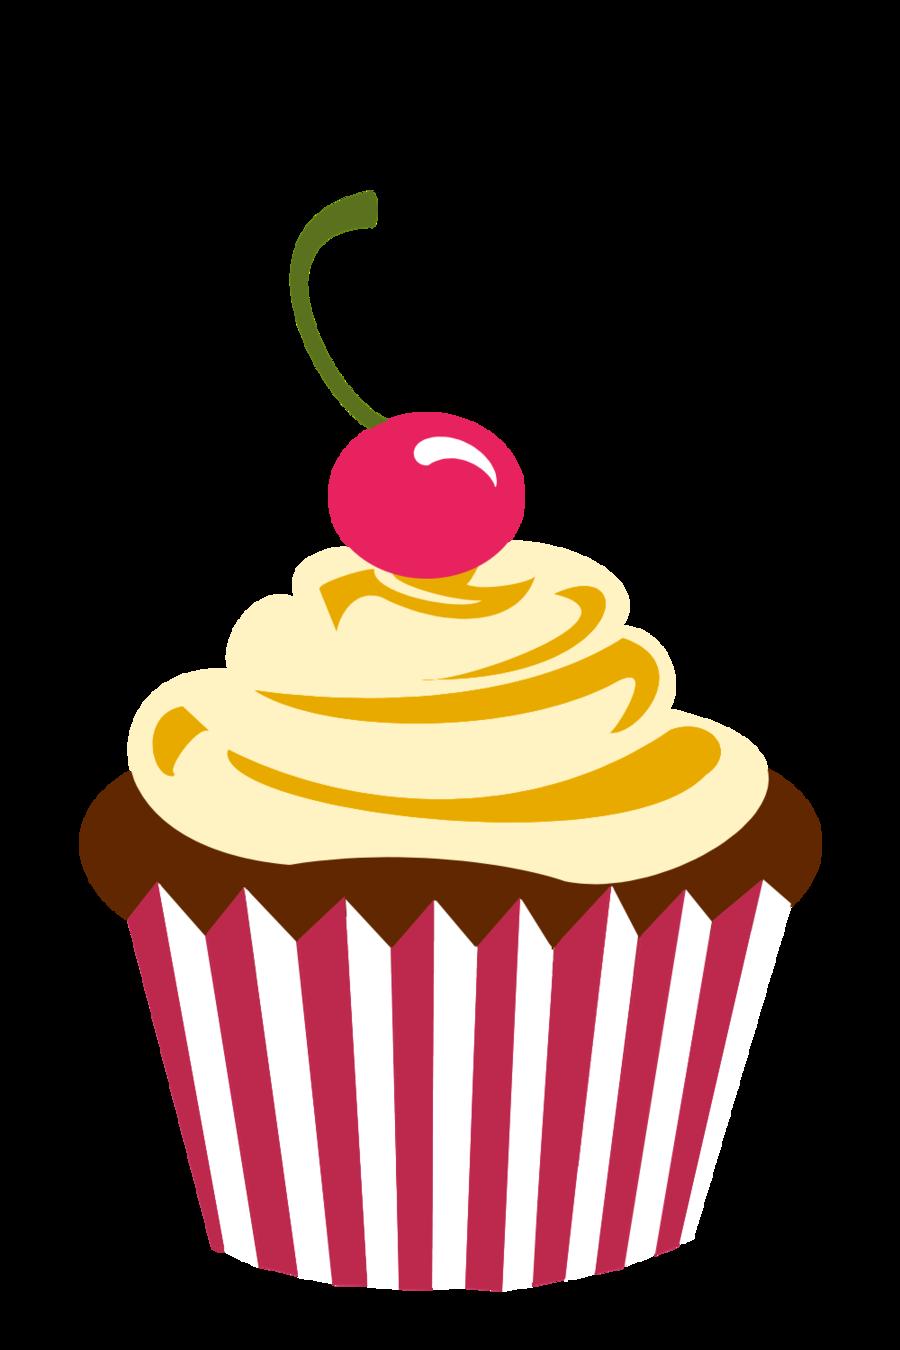 Christmas cupcake clipart svg royalty free download Cupcake Logo Png Cherry chocolate cupcake by | Party/ Cupcake Logo ... svg royalty free download